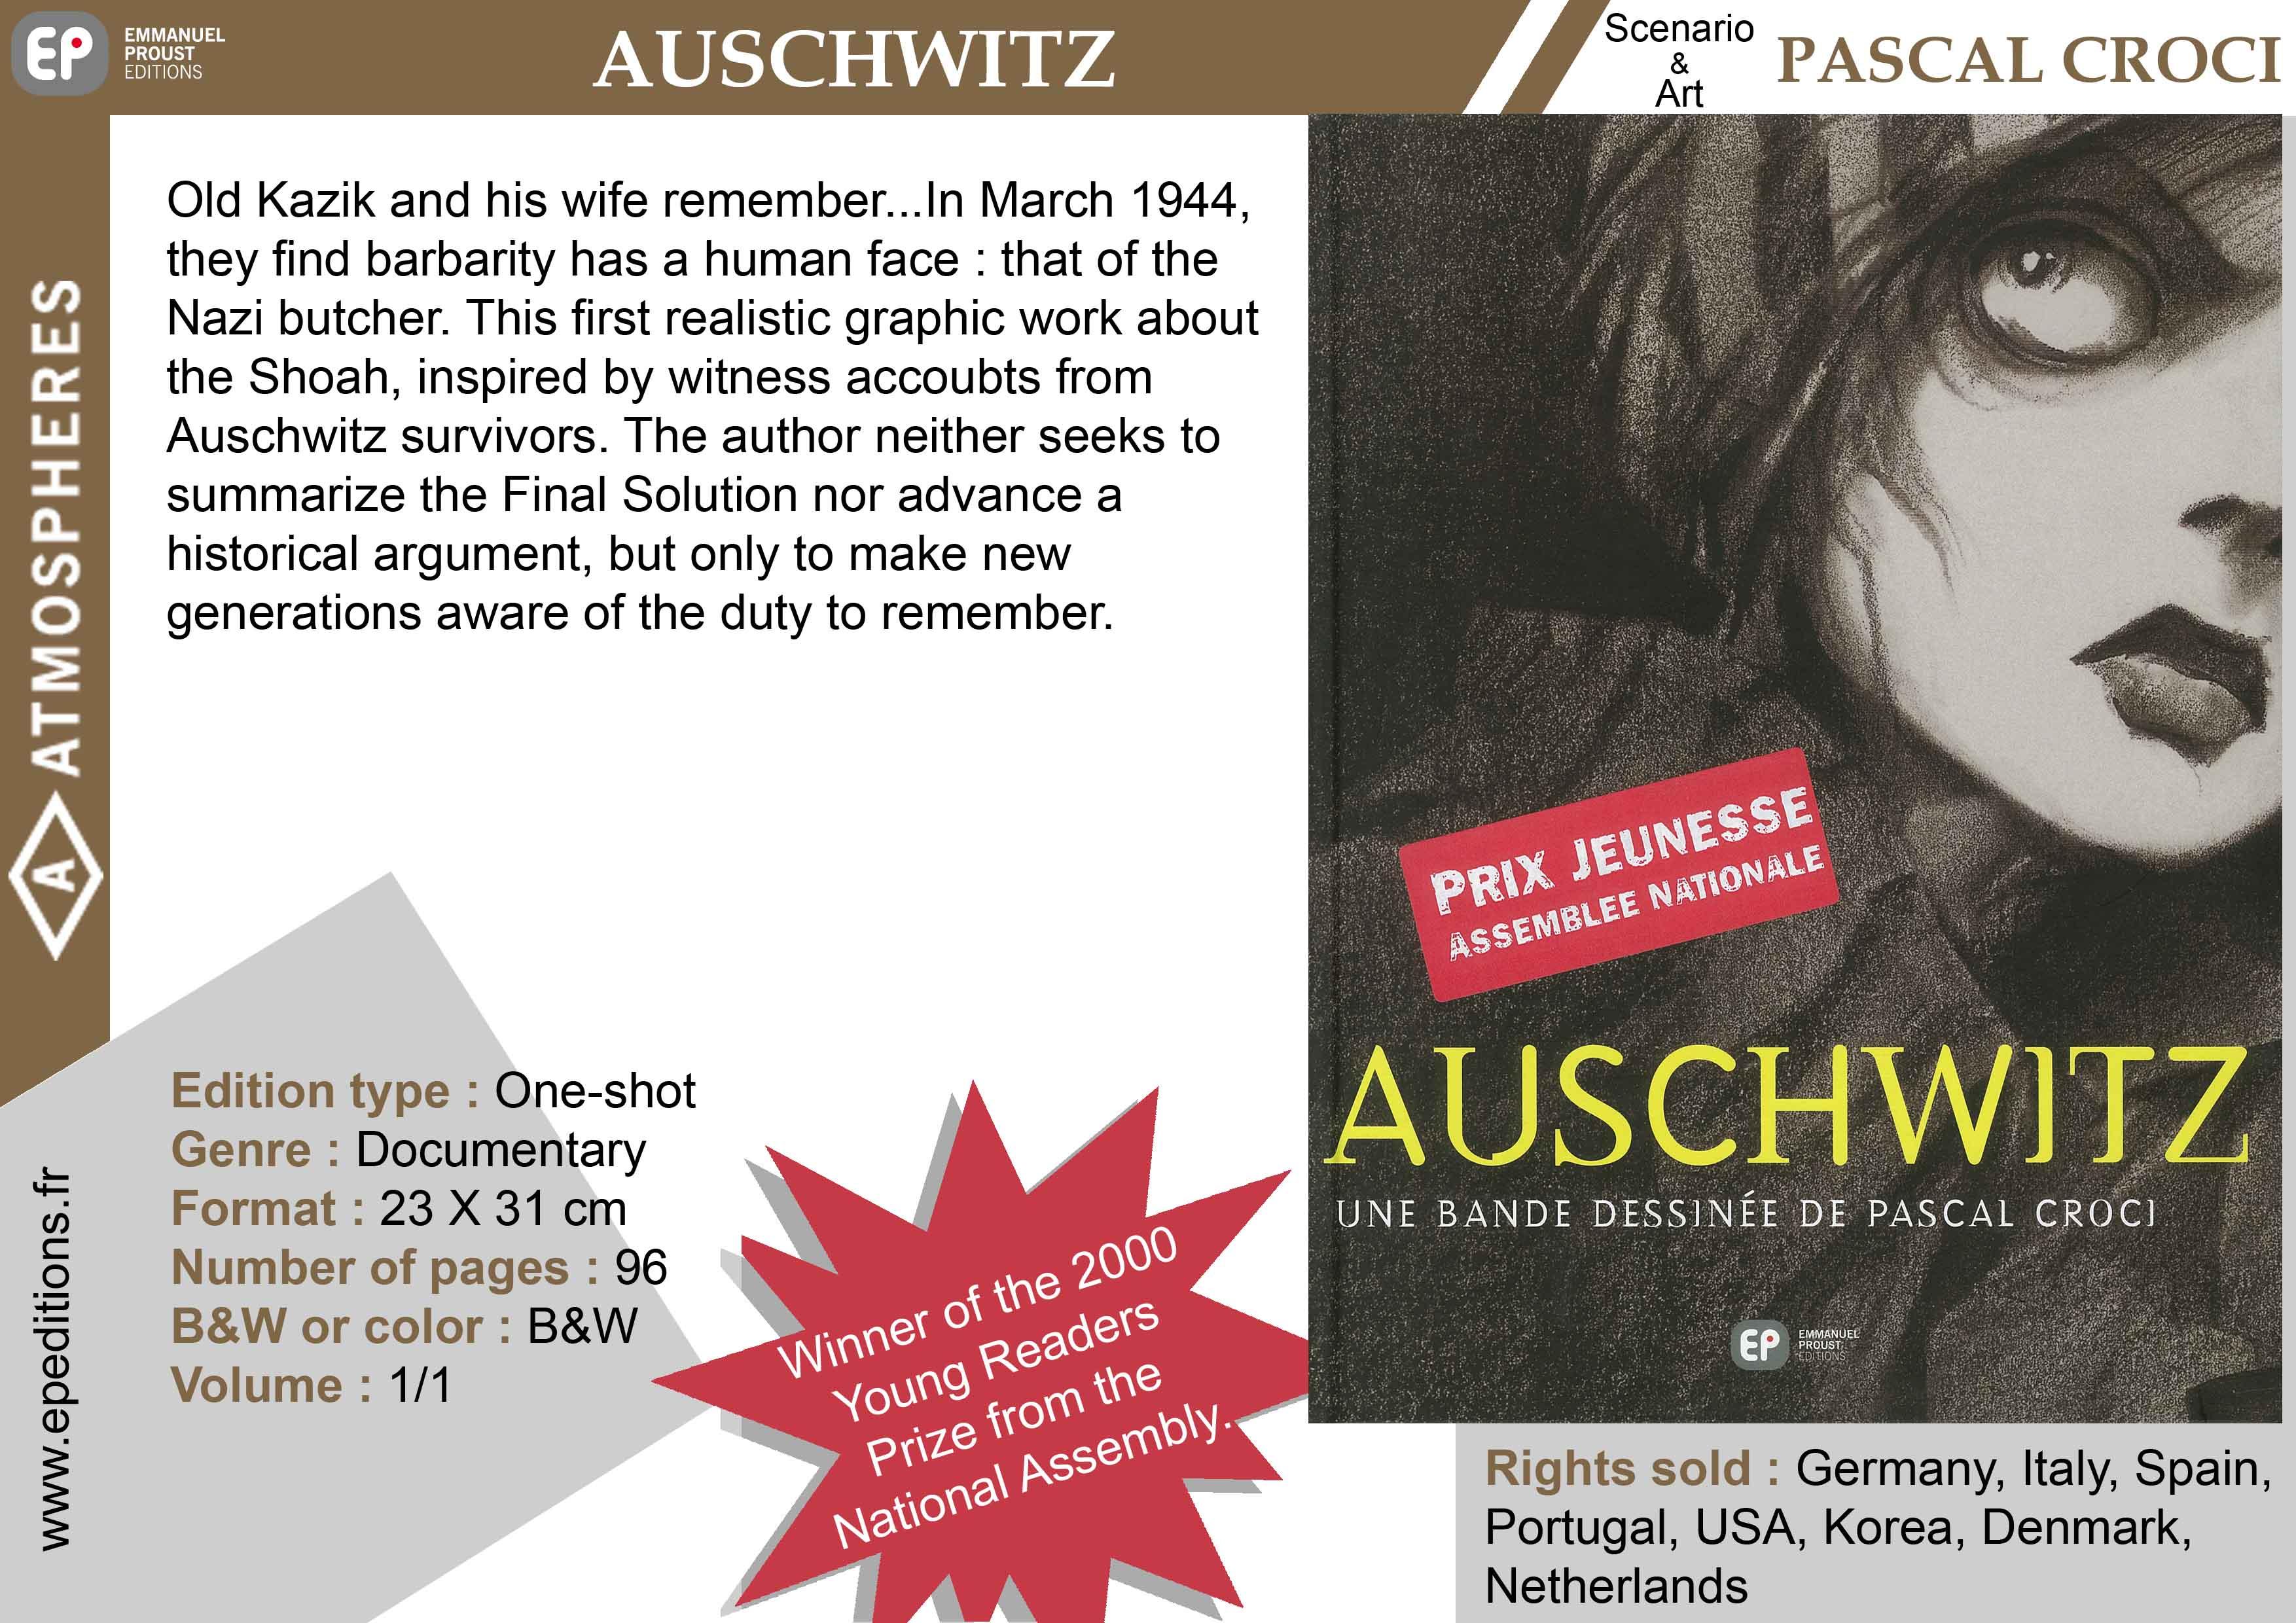 Auschwitz comics